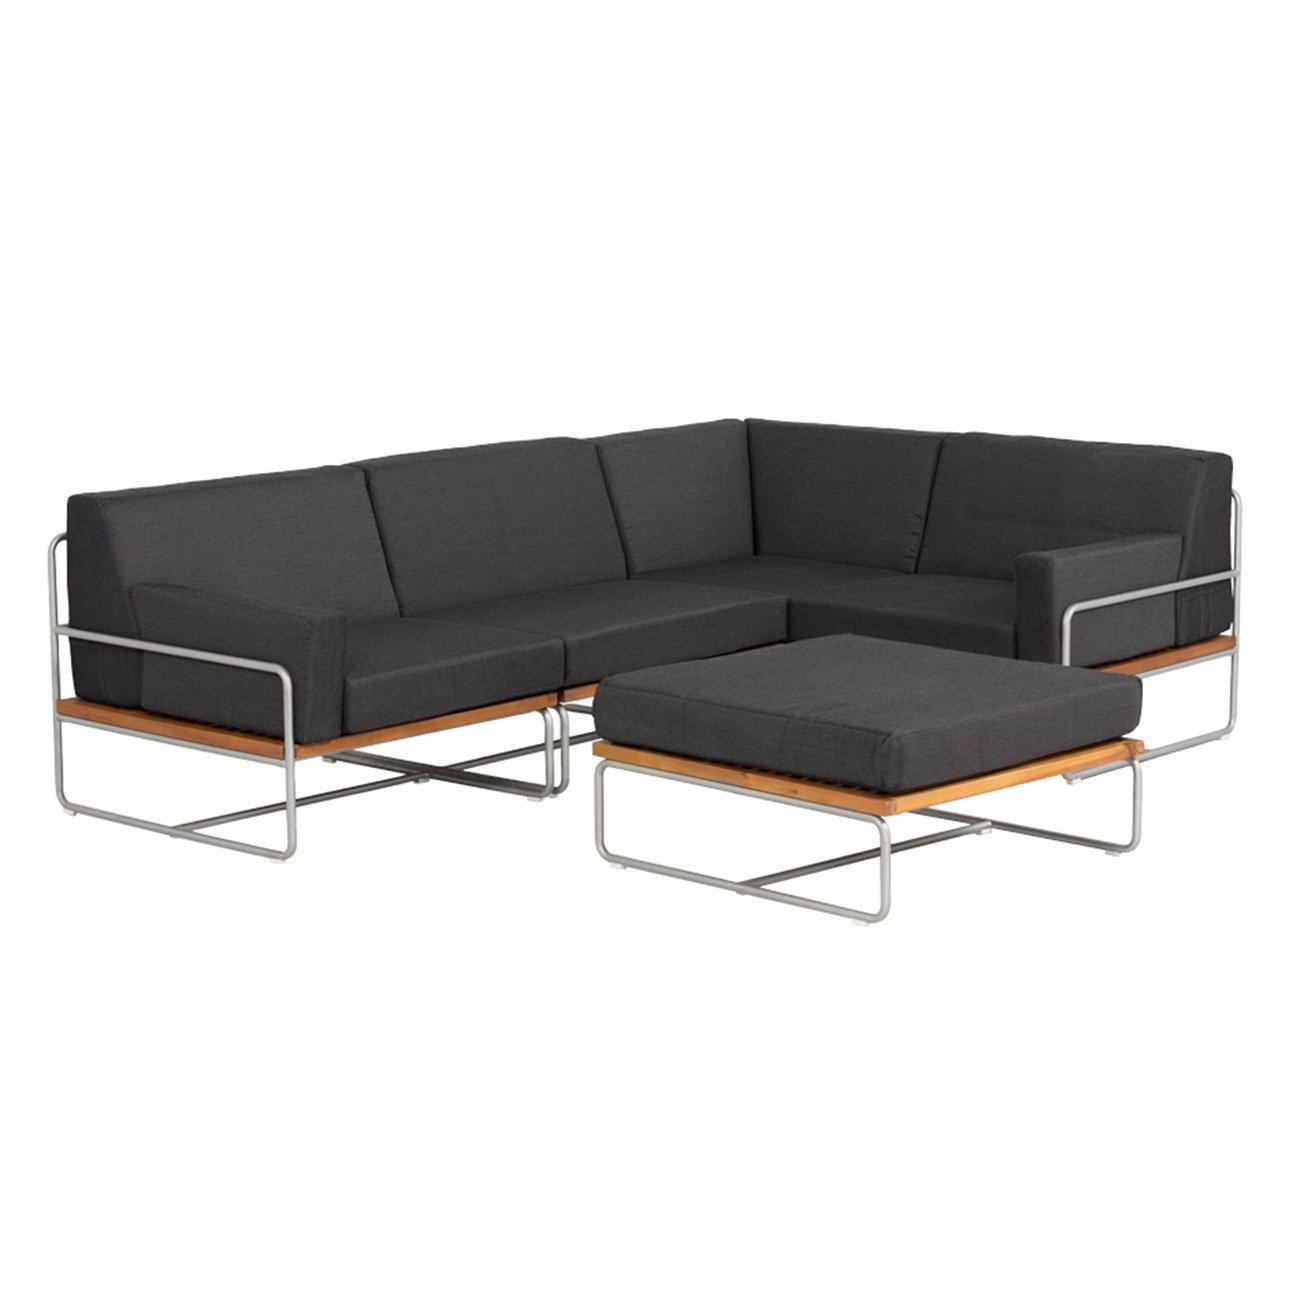 loungem bel outdoor outliv largo gartenlounge 5 teilig stahl akazie mit textil polstern in grau. Black Bedroom Furniture Sets. Home Design Ideas